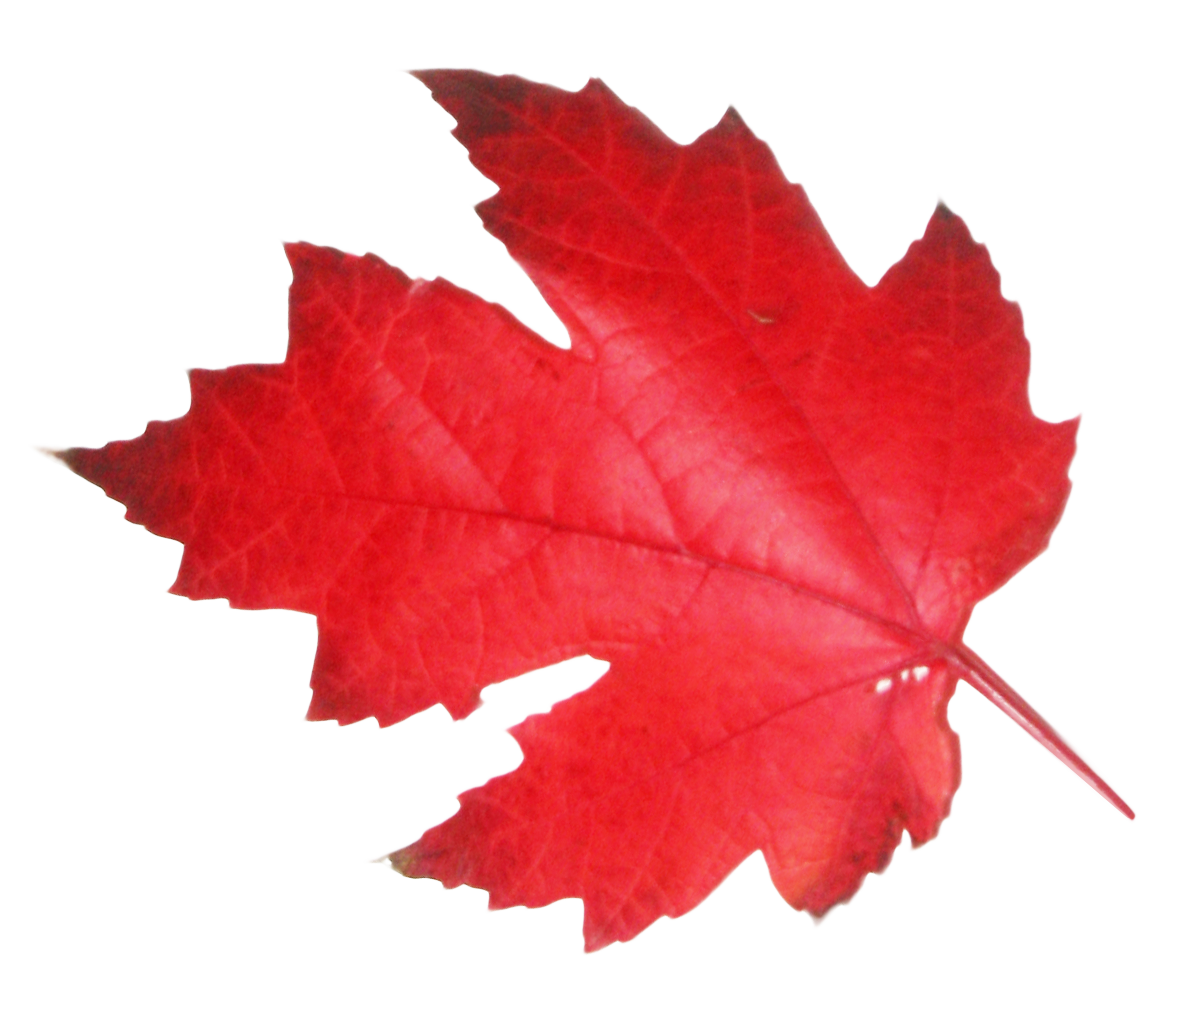 Red Leaf Png Image Png Images Image Maple Leaf Tattoo